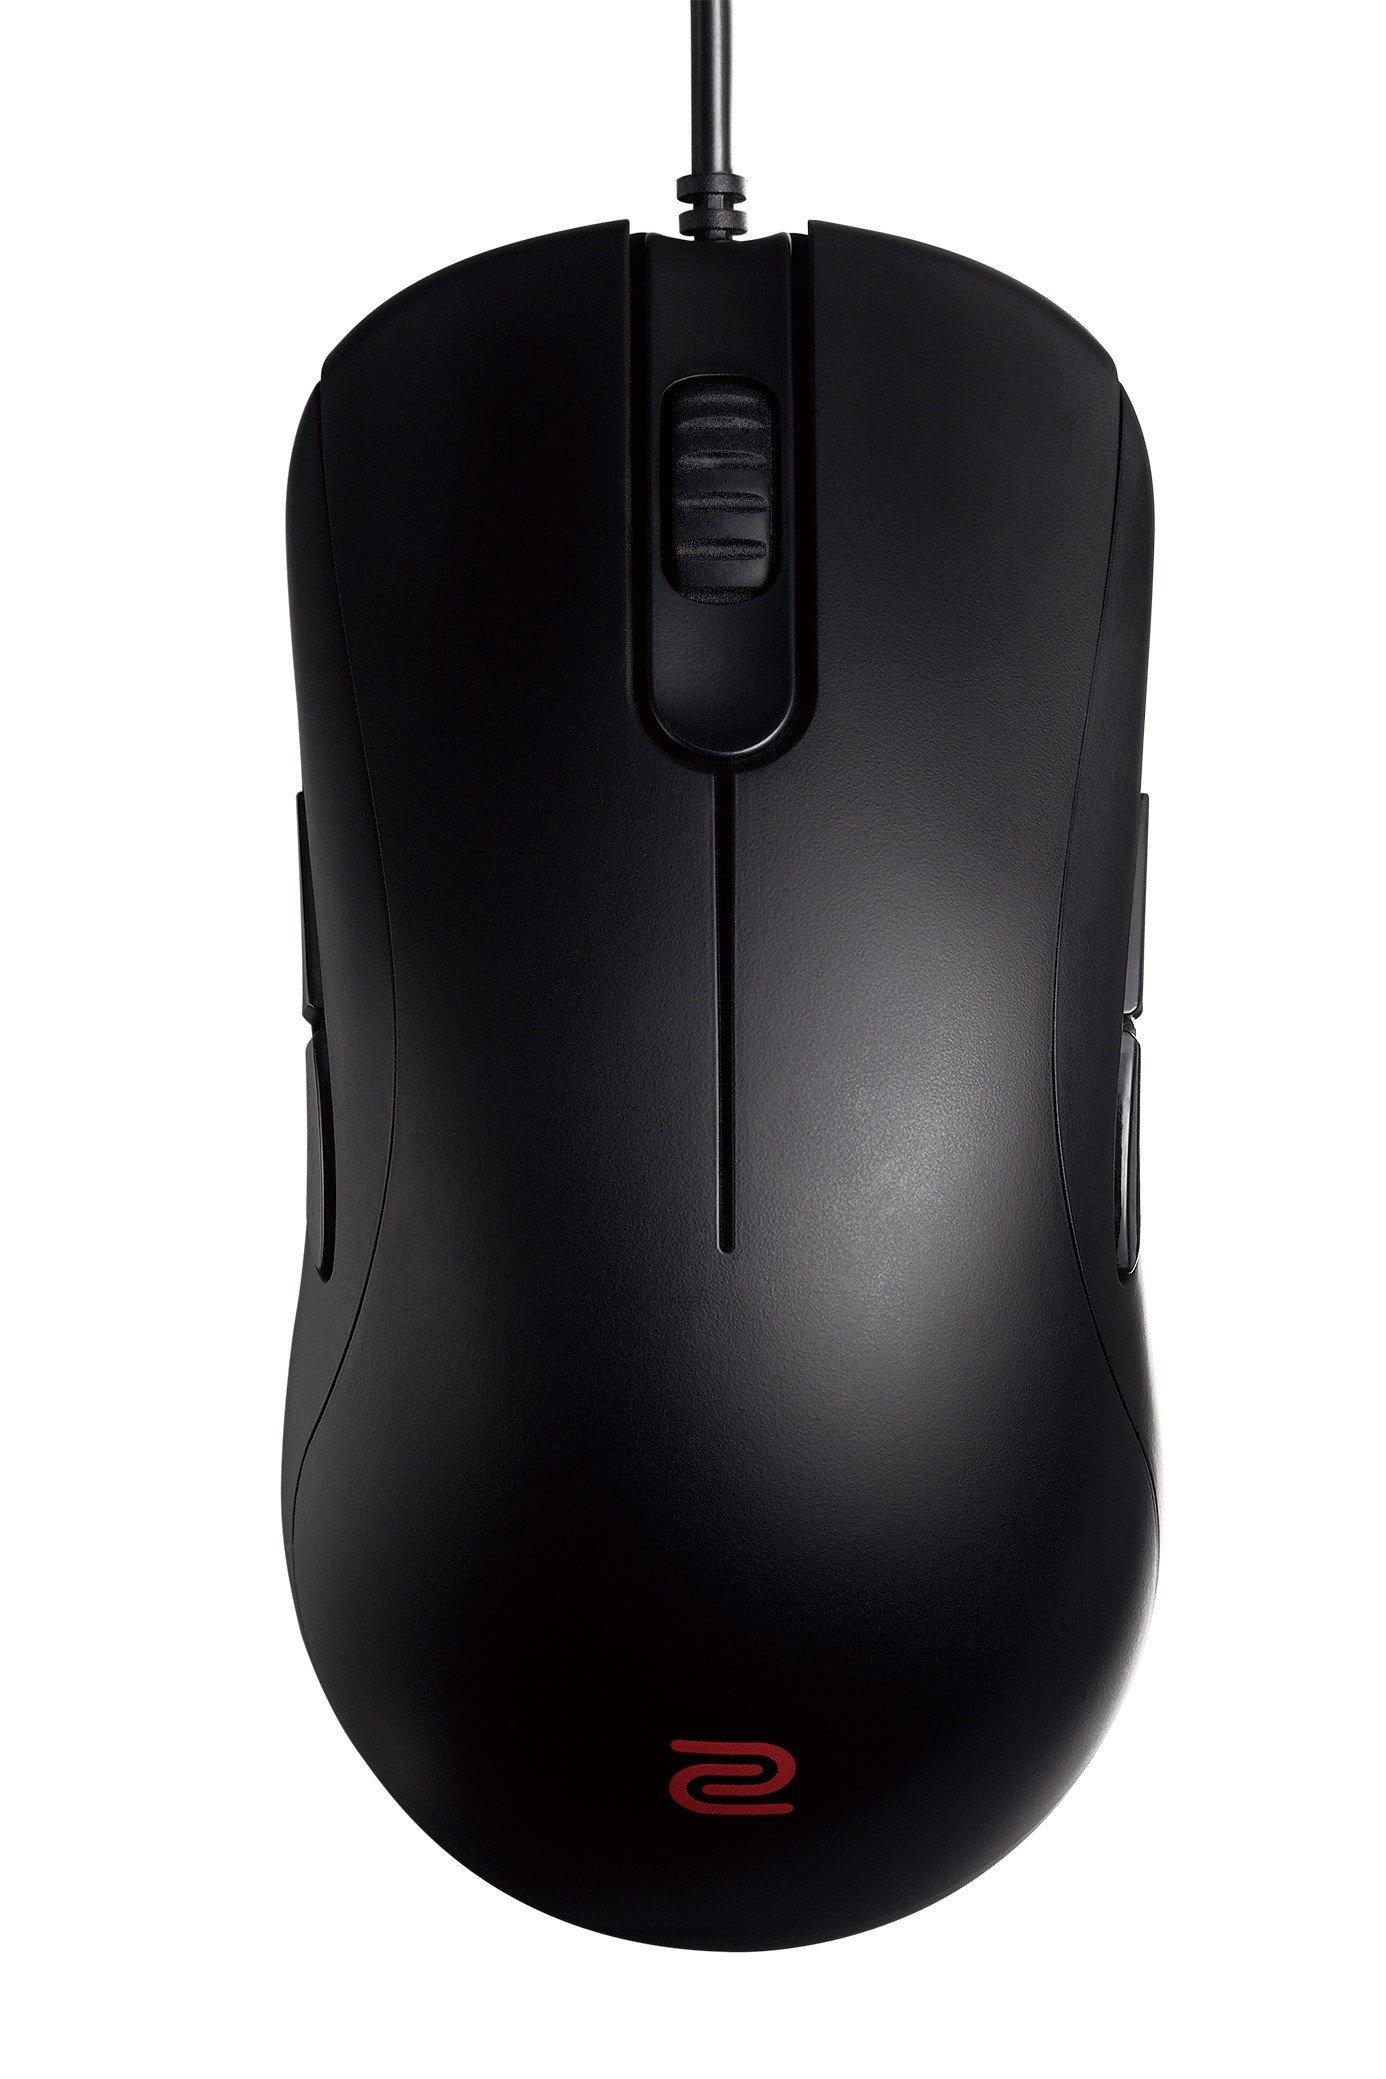 Mouse Gamer : BenQ ZOWIE ZA11 Ambidextrous para Esports (L)